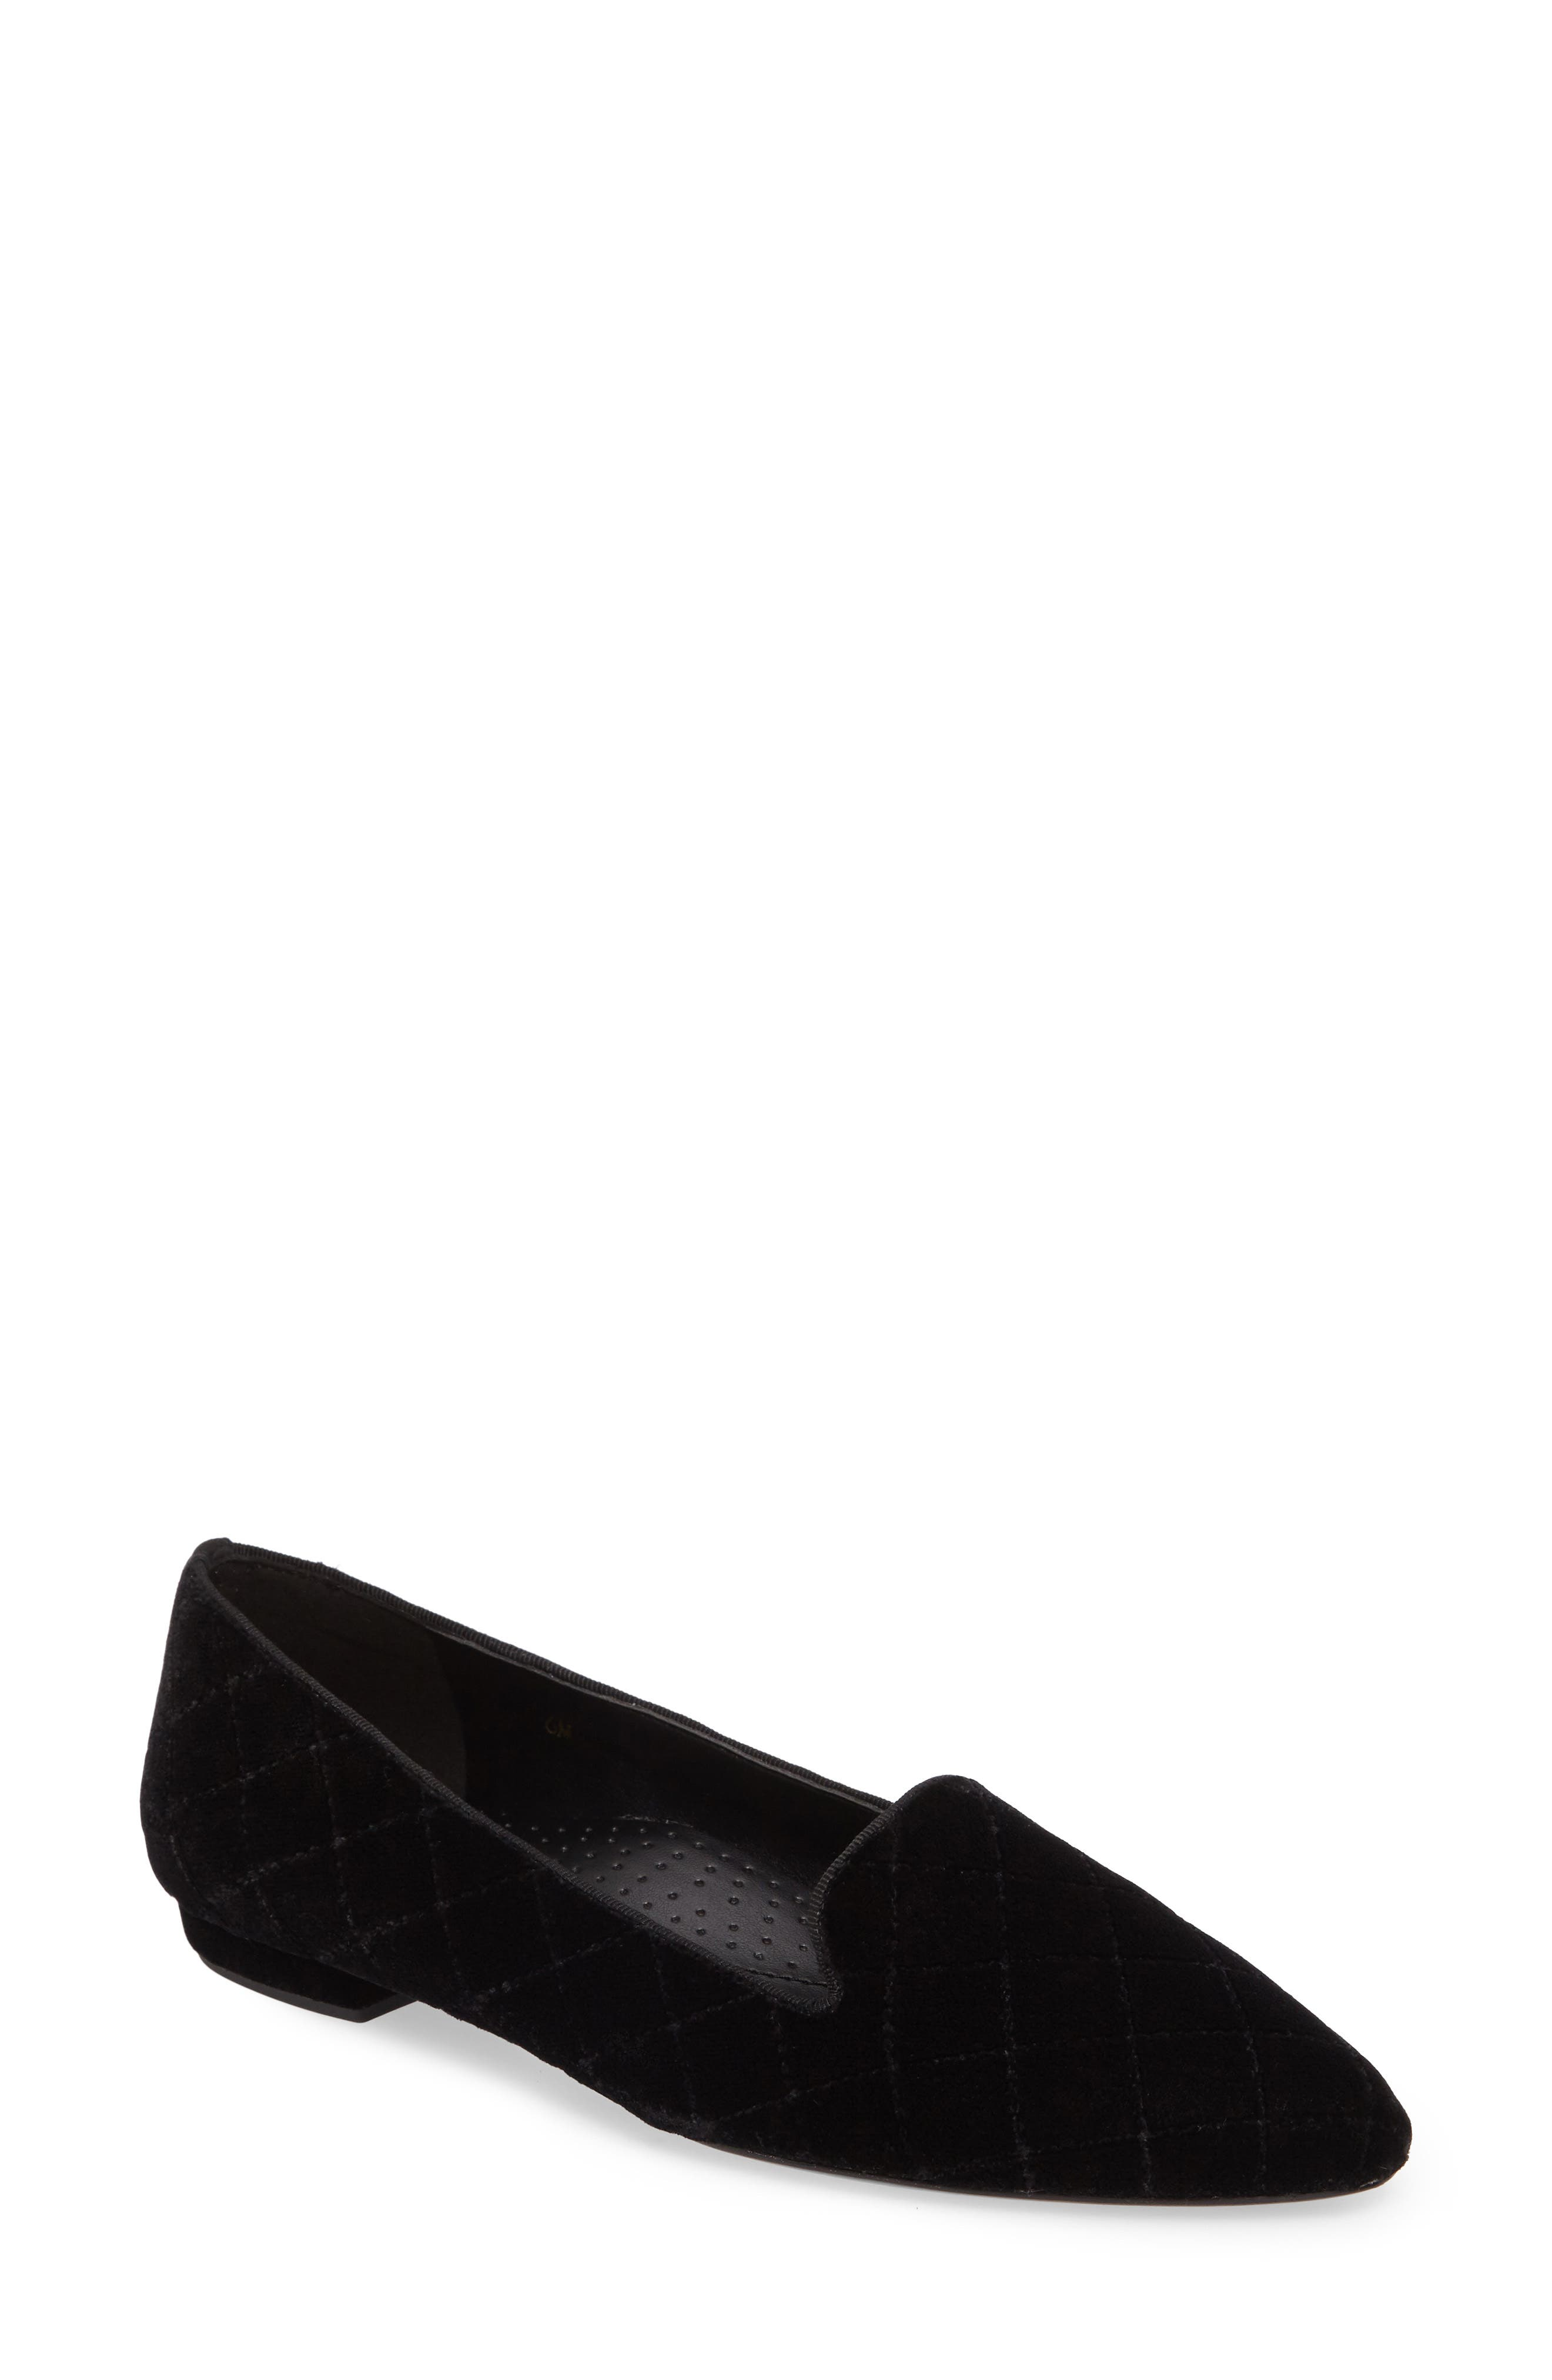 Gannie Diamond Pattern Loafer,                         Main,                         color, Black Velvet Fabric